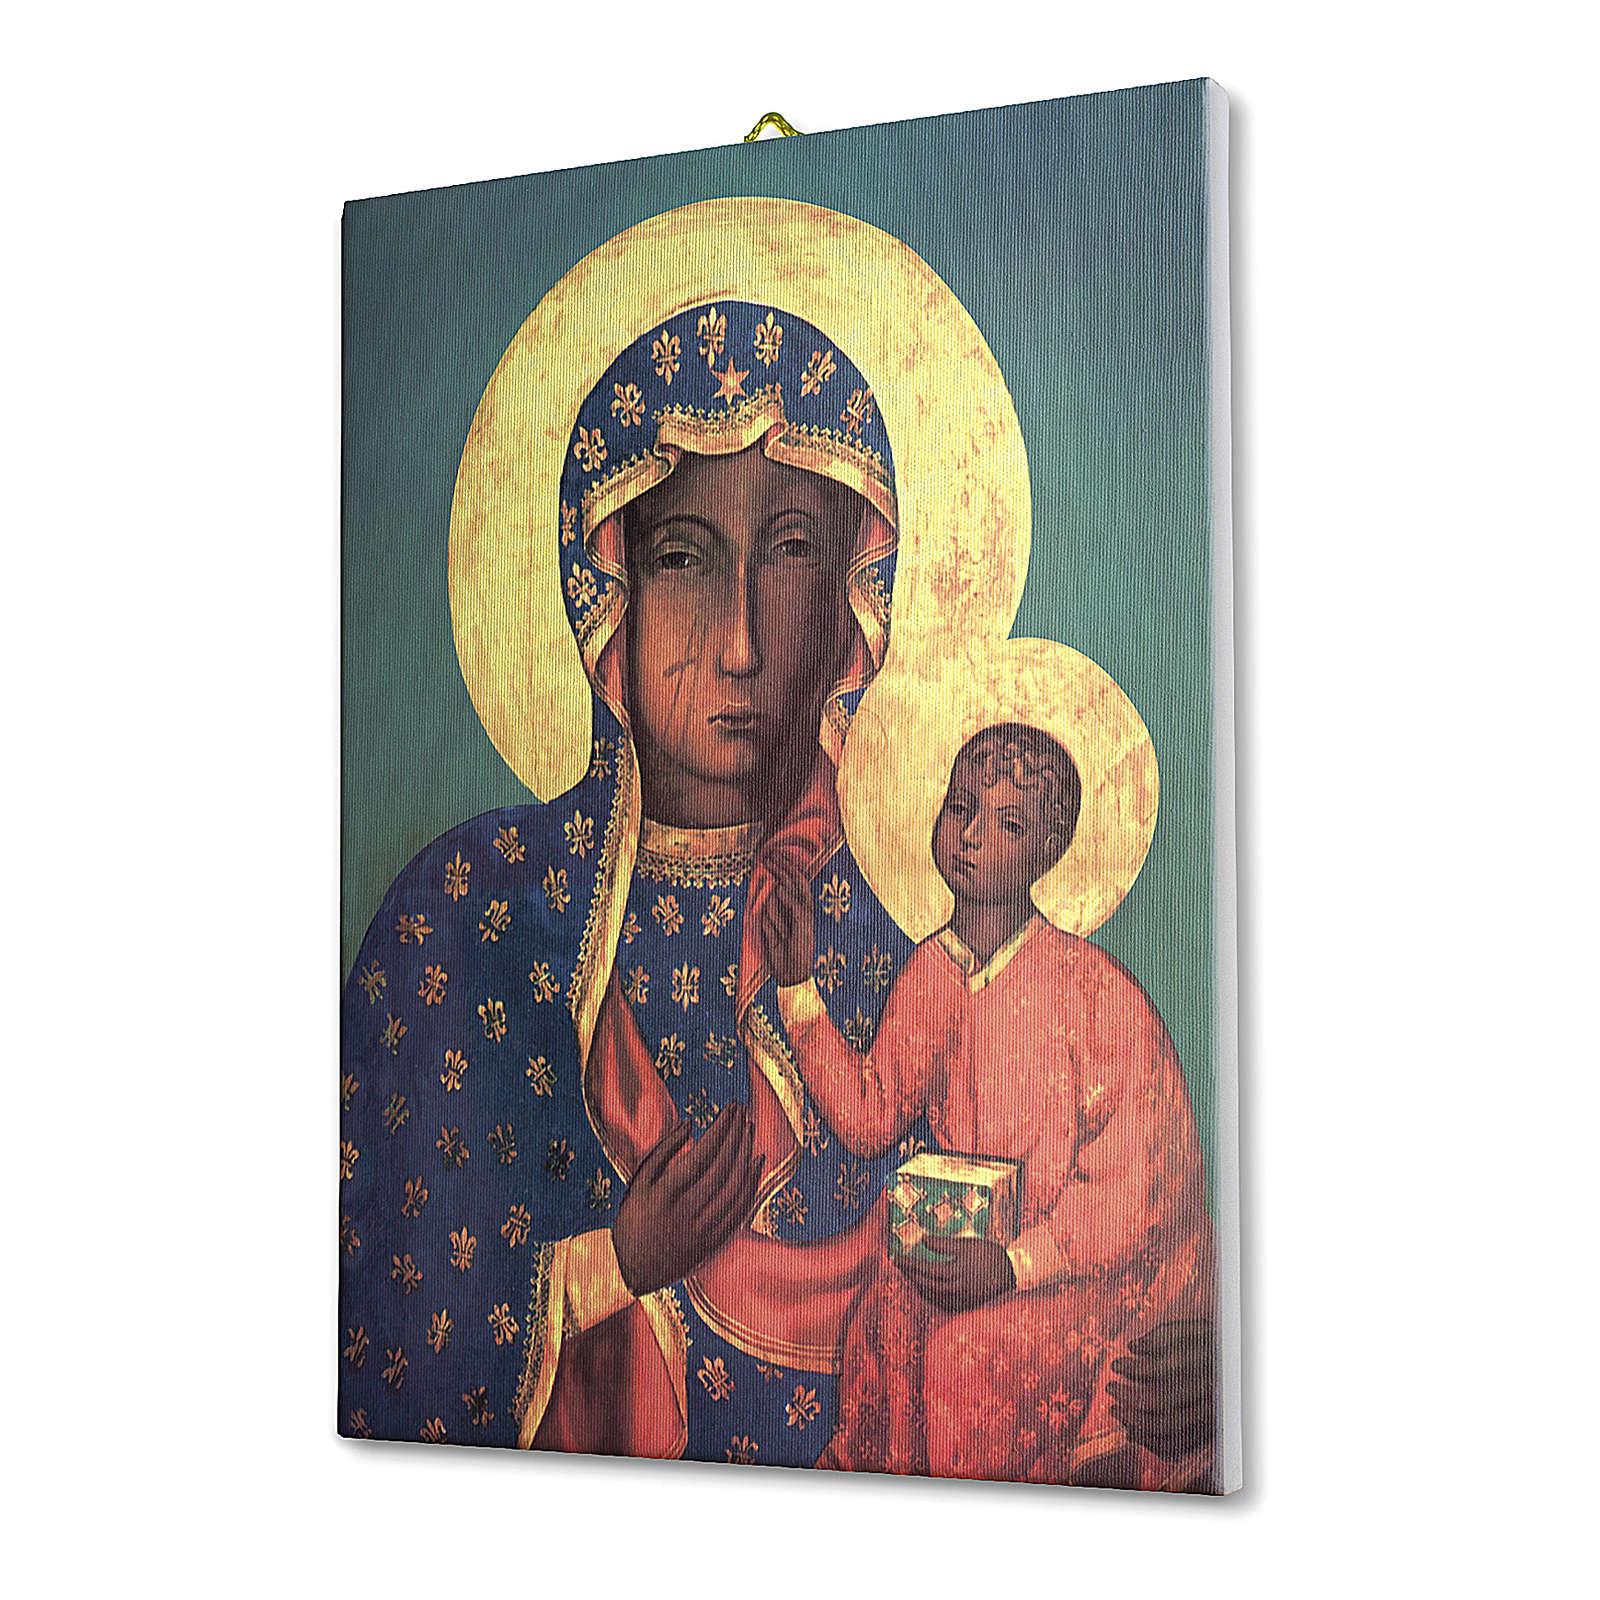 Cuadro sobre tela pictórica Virgen de Czestochowa 25x20 cm 3